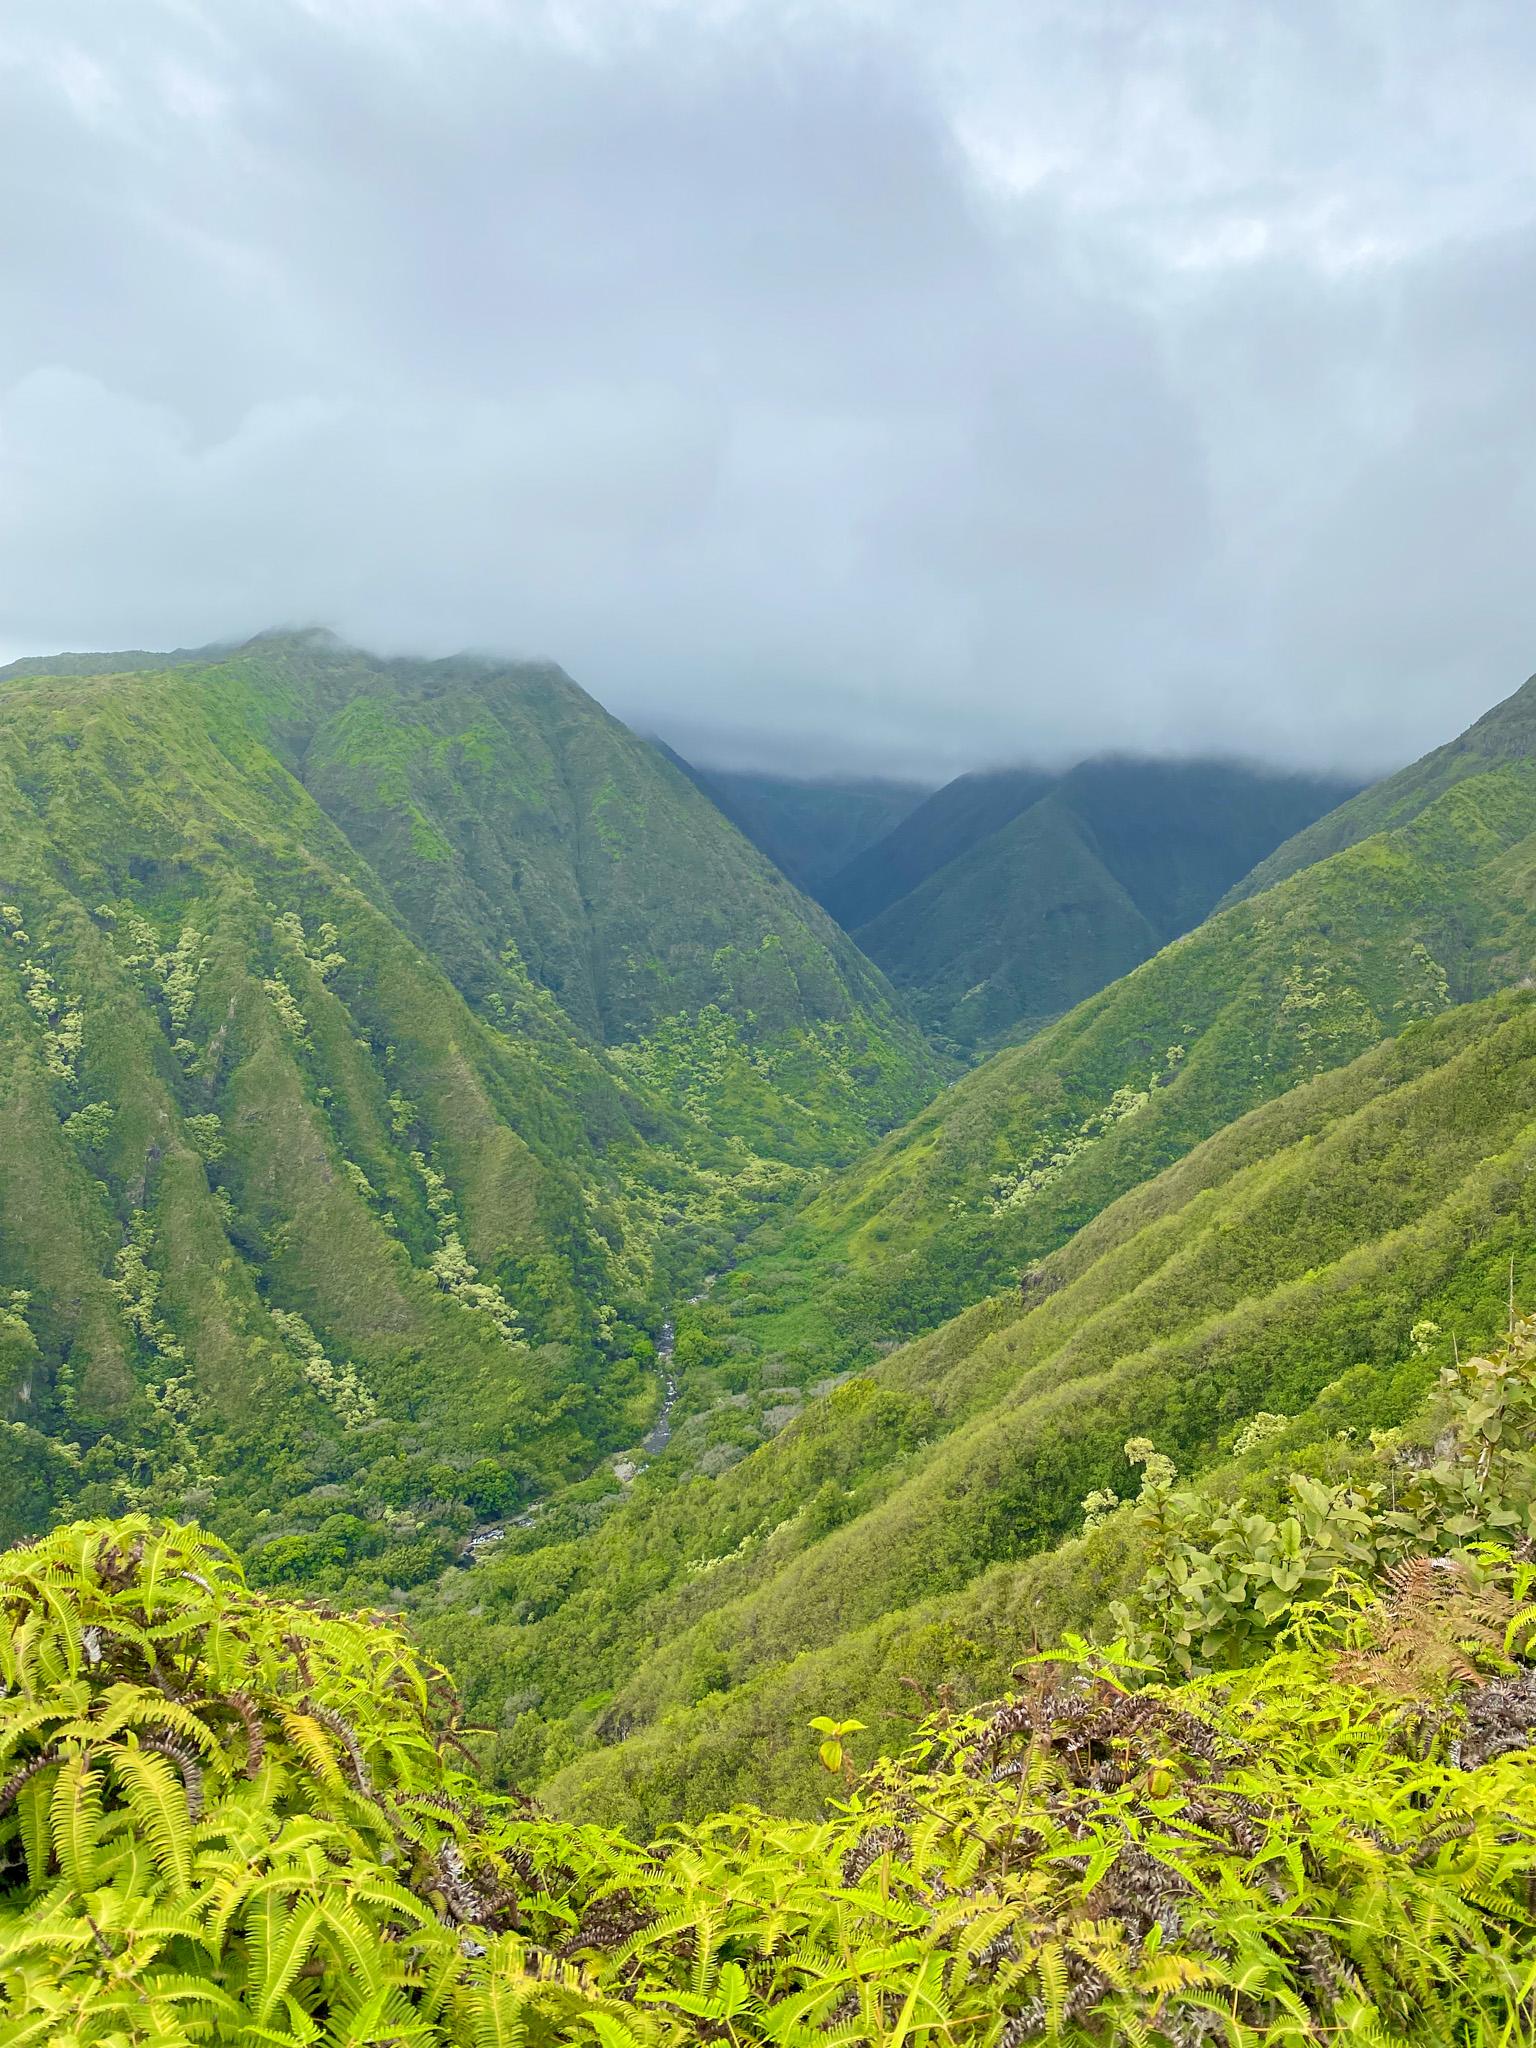 traveling to hawaii maui, hikes in hawaii maui, maui covid travel, luxury travel, black girl travel guide